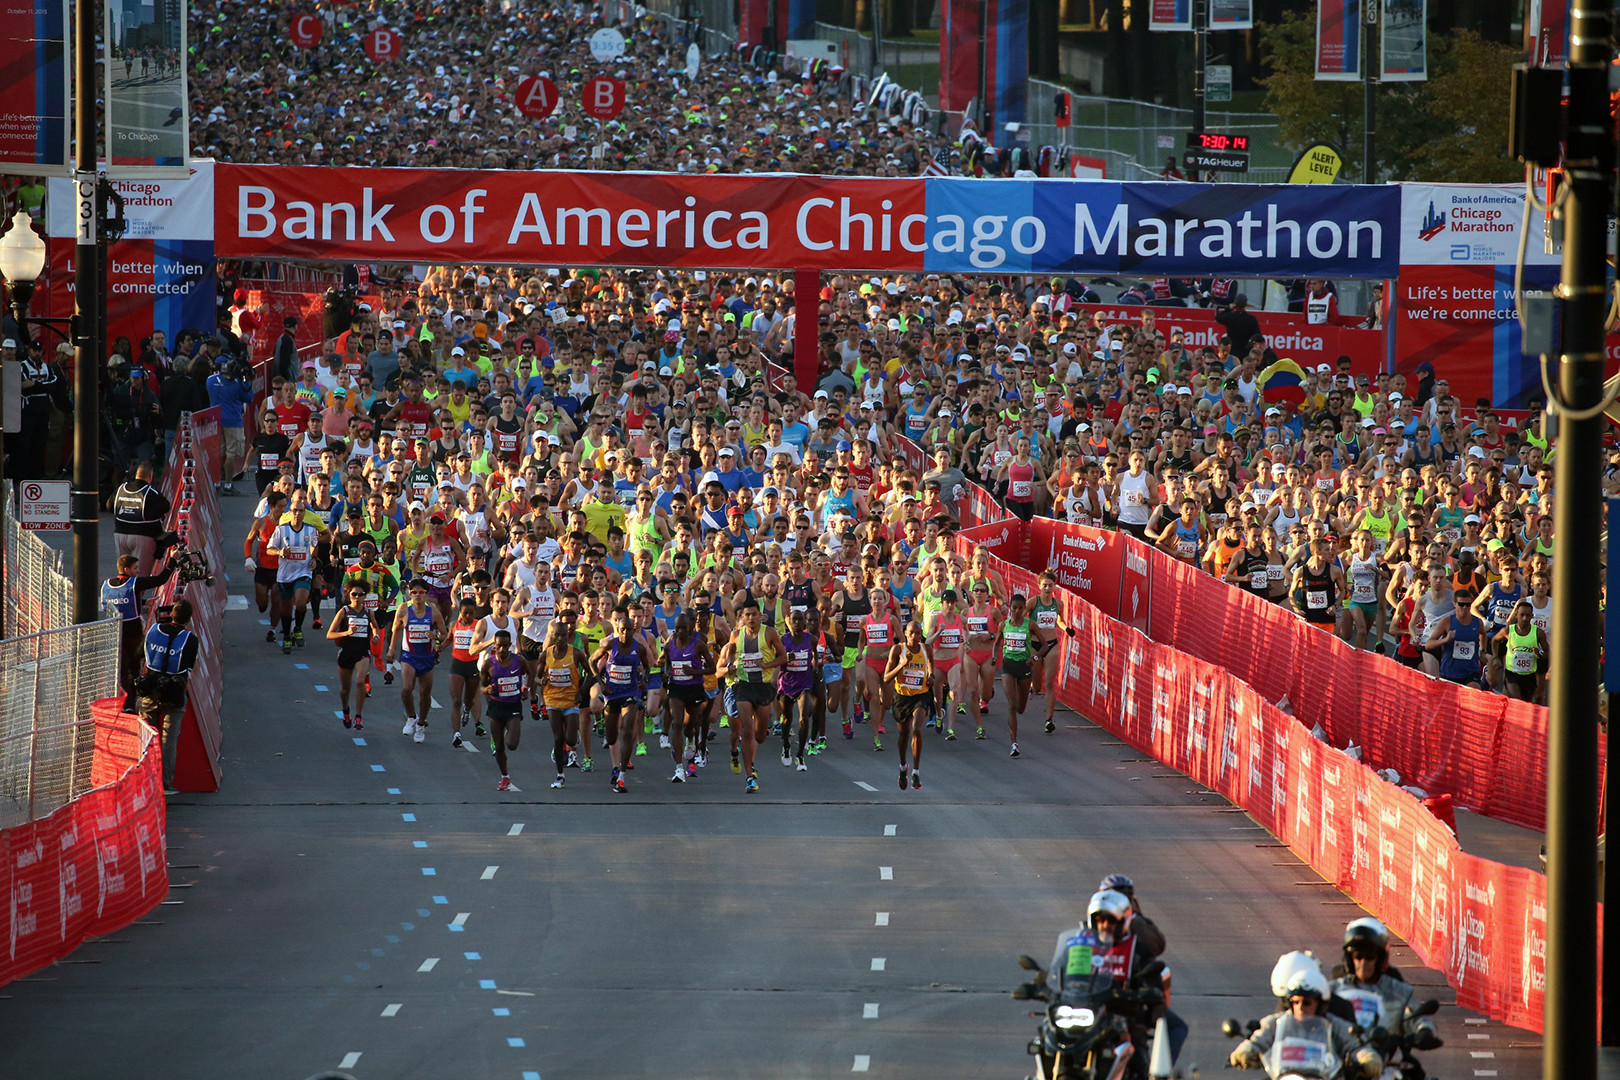 Chicago Marathon Map Details For The  Edition Chicago Tribune - Chicago marathon map 2016